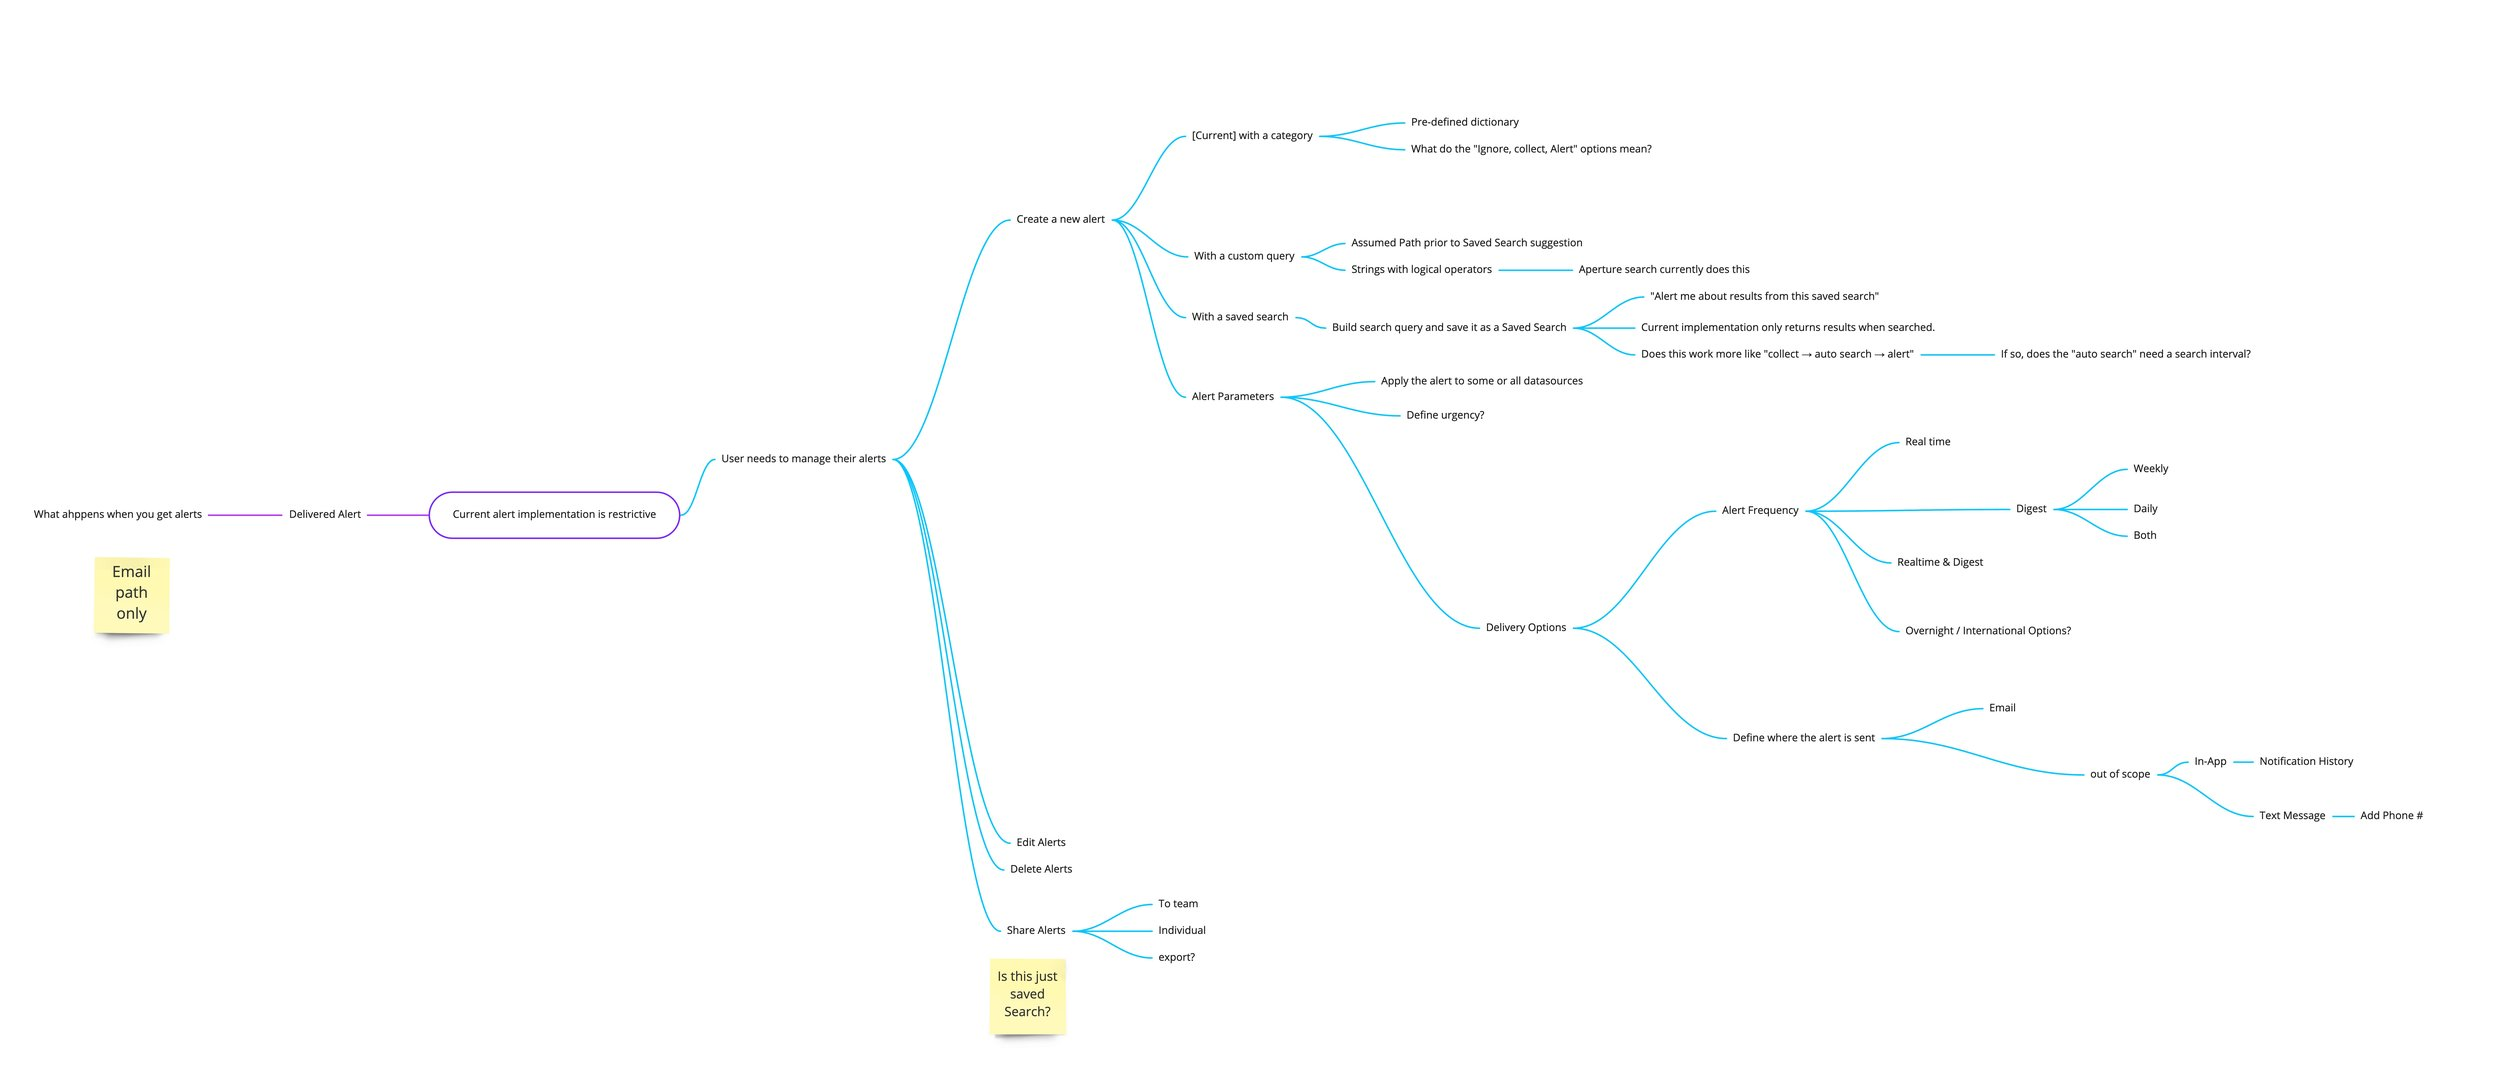 Alerting Takeaways and Documentation - New frame (1).jpg